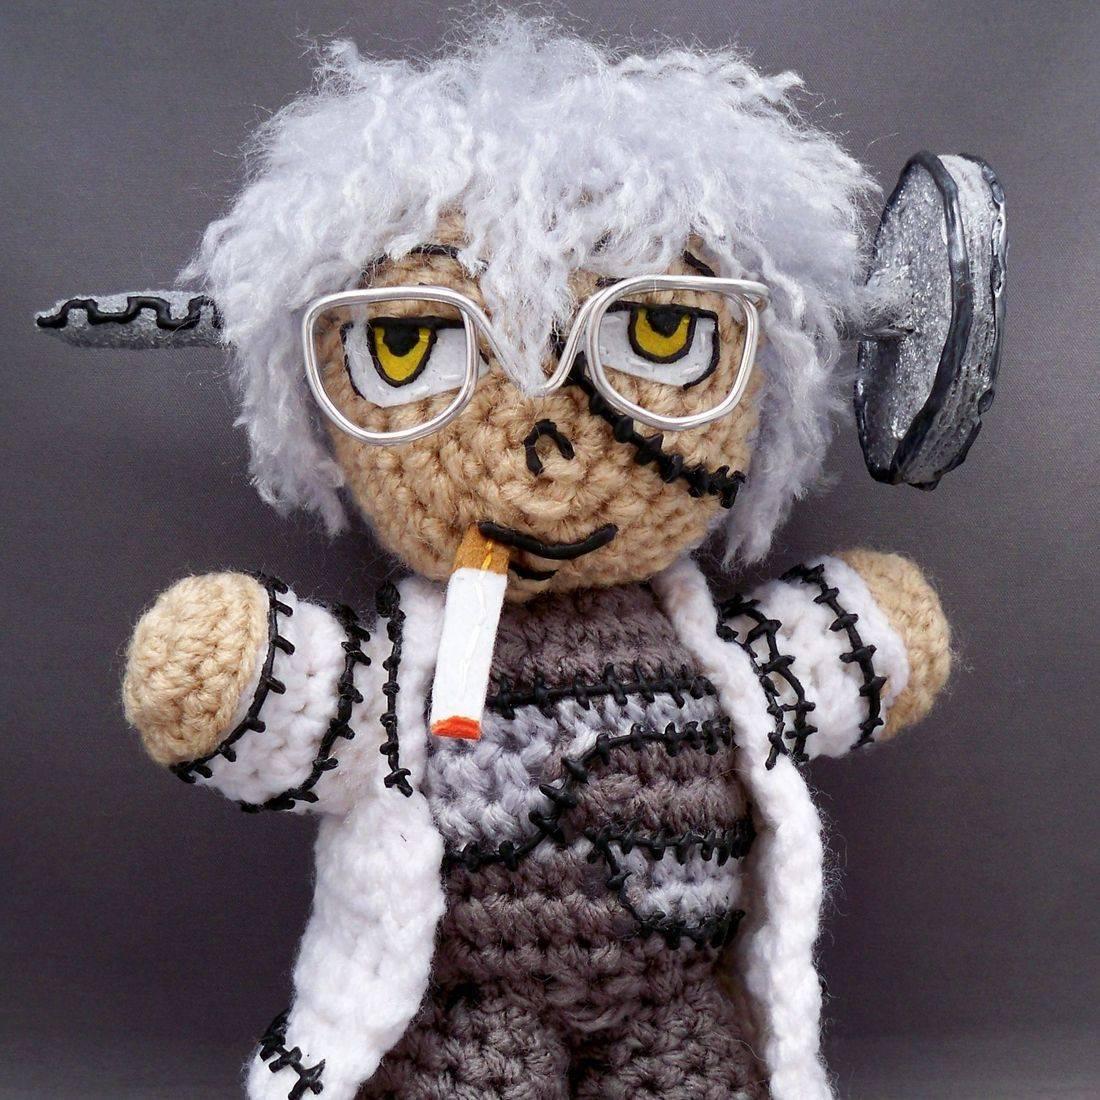 Dr. Stein, Soul Eater, amigurumi, plush, doll, anime, otaku, handmade, crochet